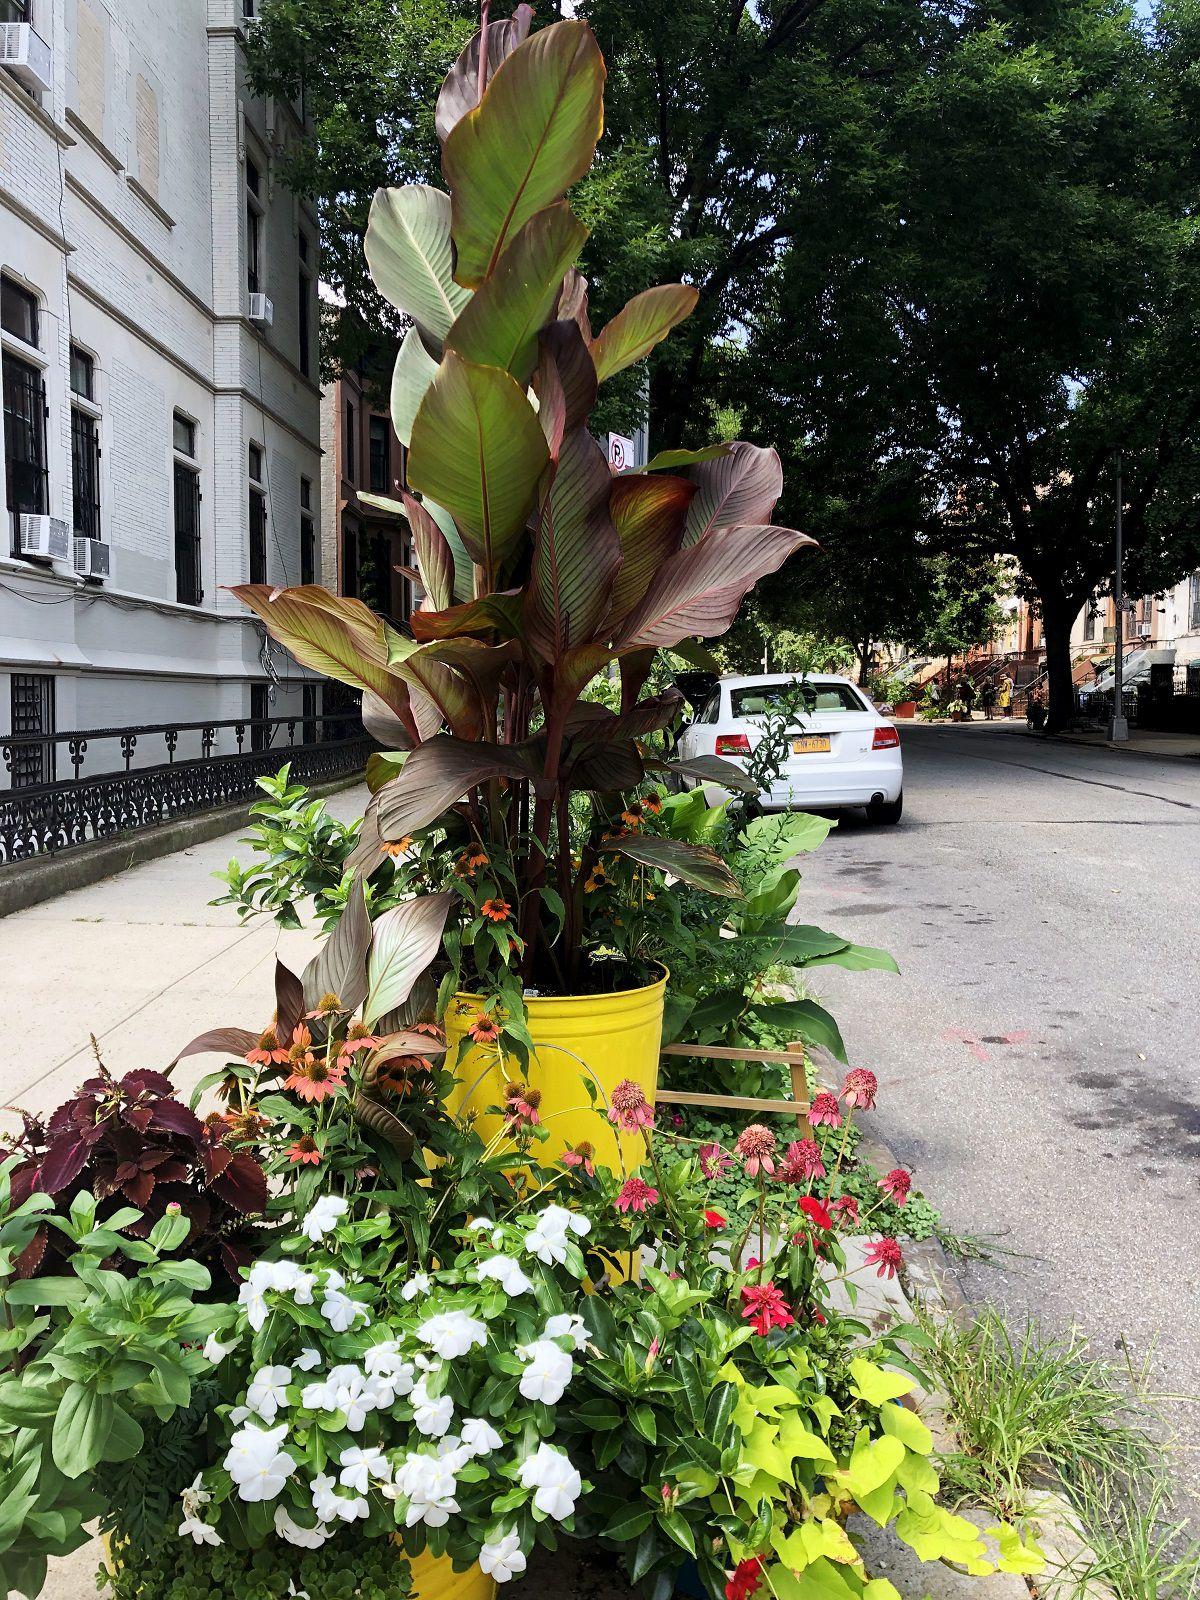 A variety of plants decorating a sidewalk.